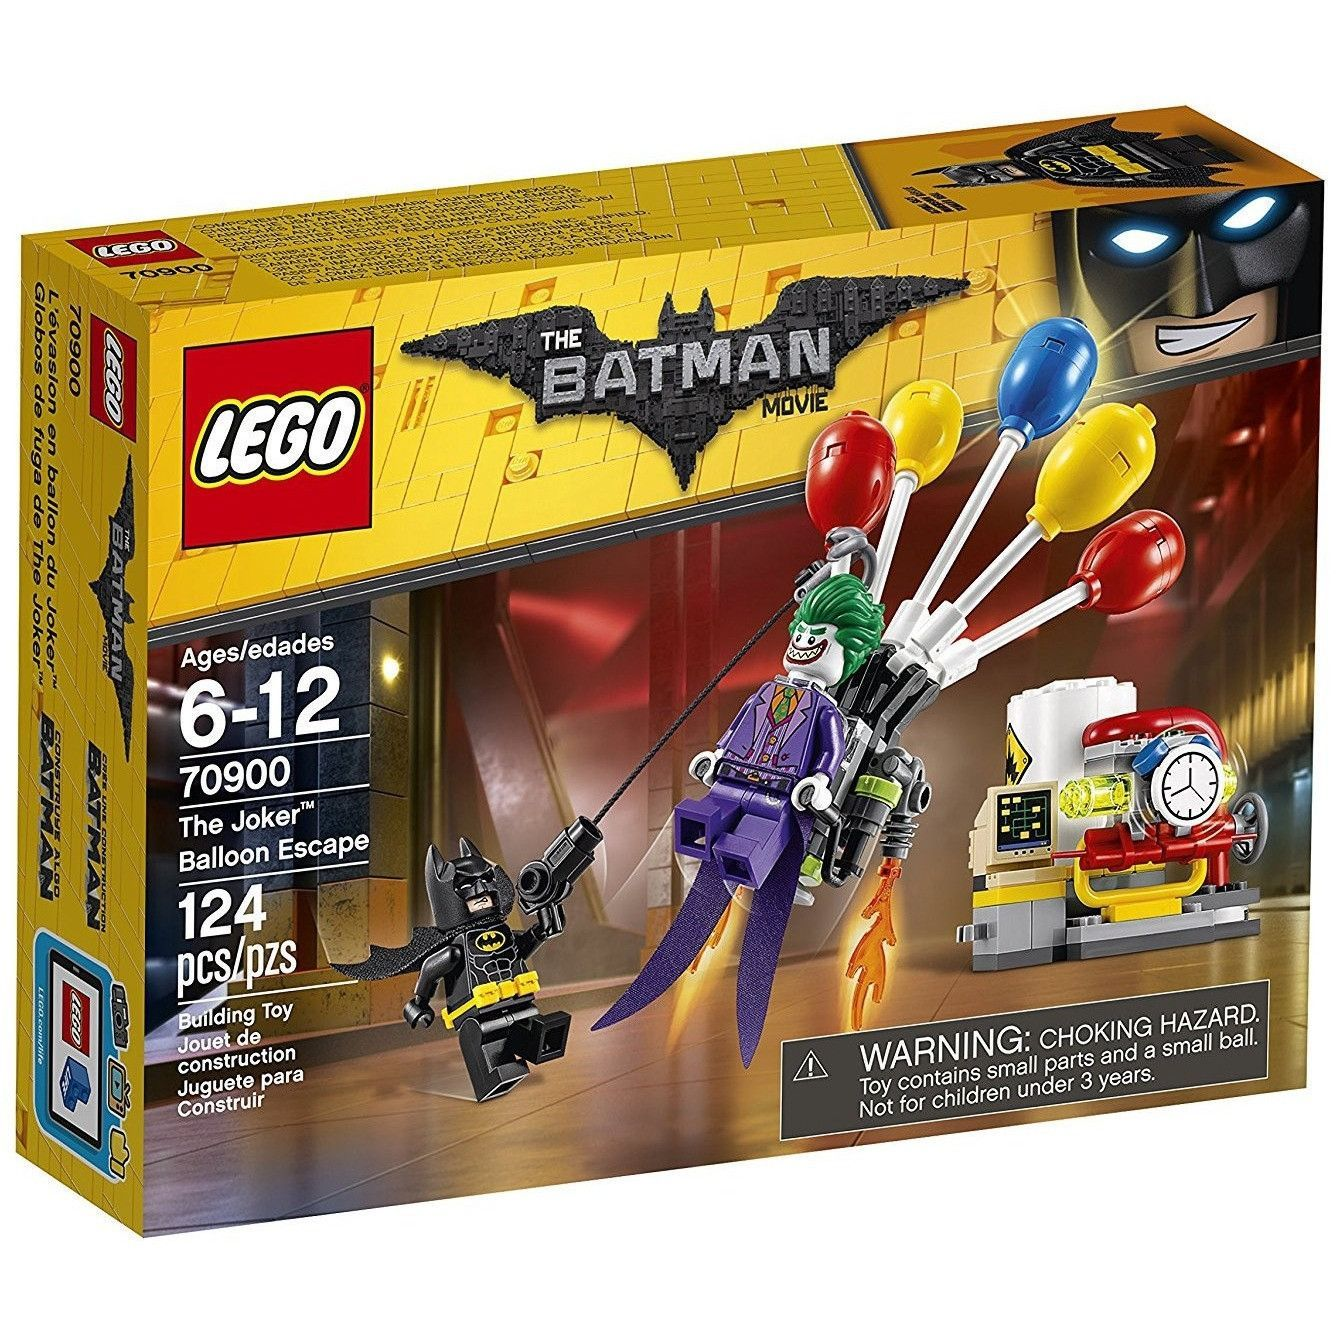 BATMAN MINIFIGURE SPLIT FROM SET 70900 LEGO DC COMICS BATMAN MOVIE